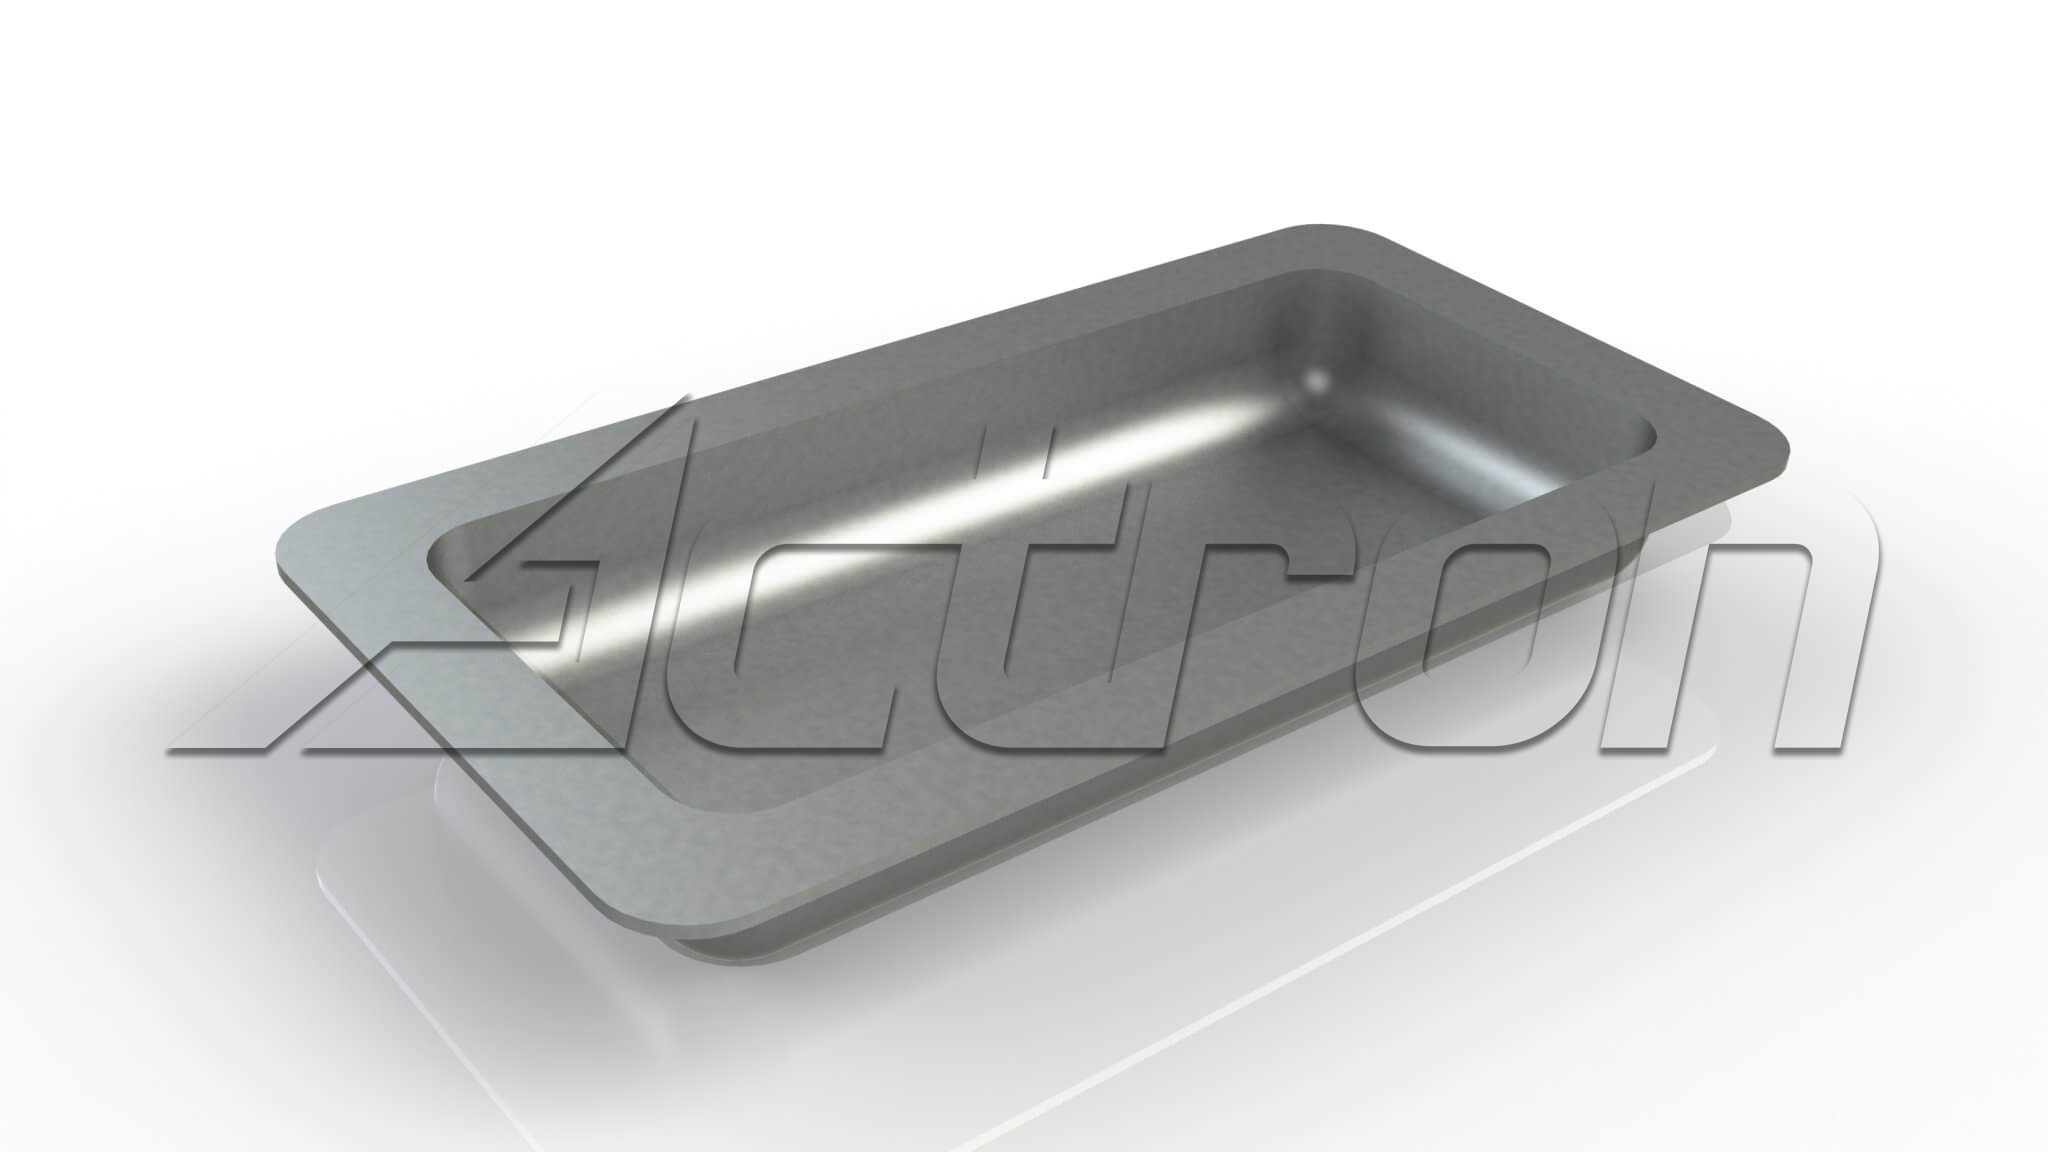 cup-pull-5164-a45015.jpg